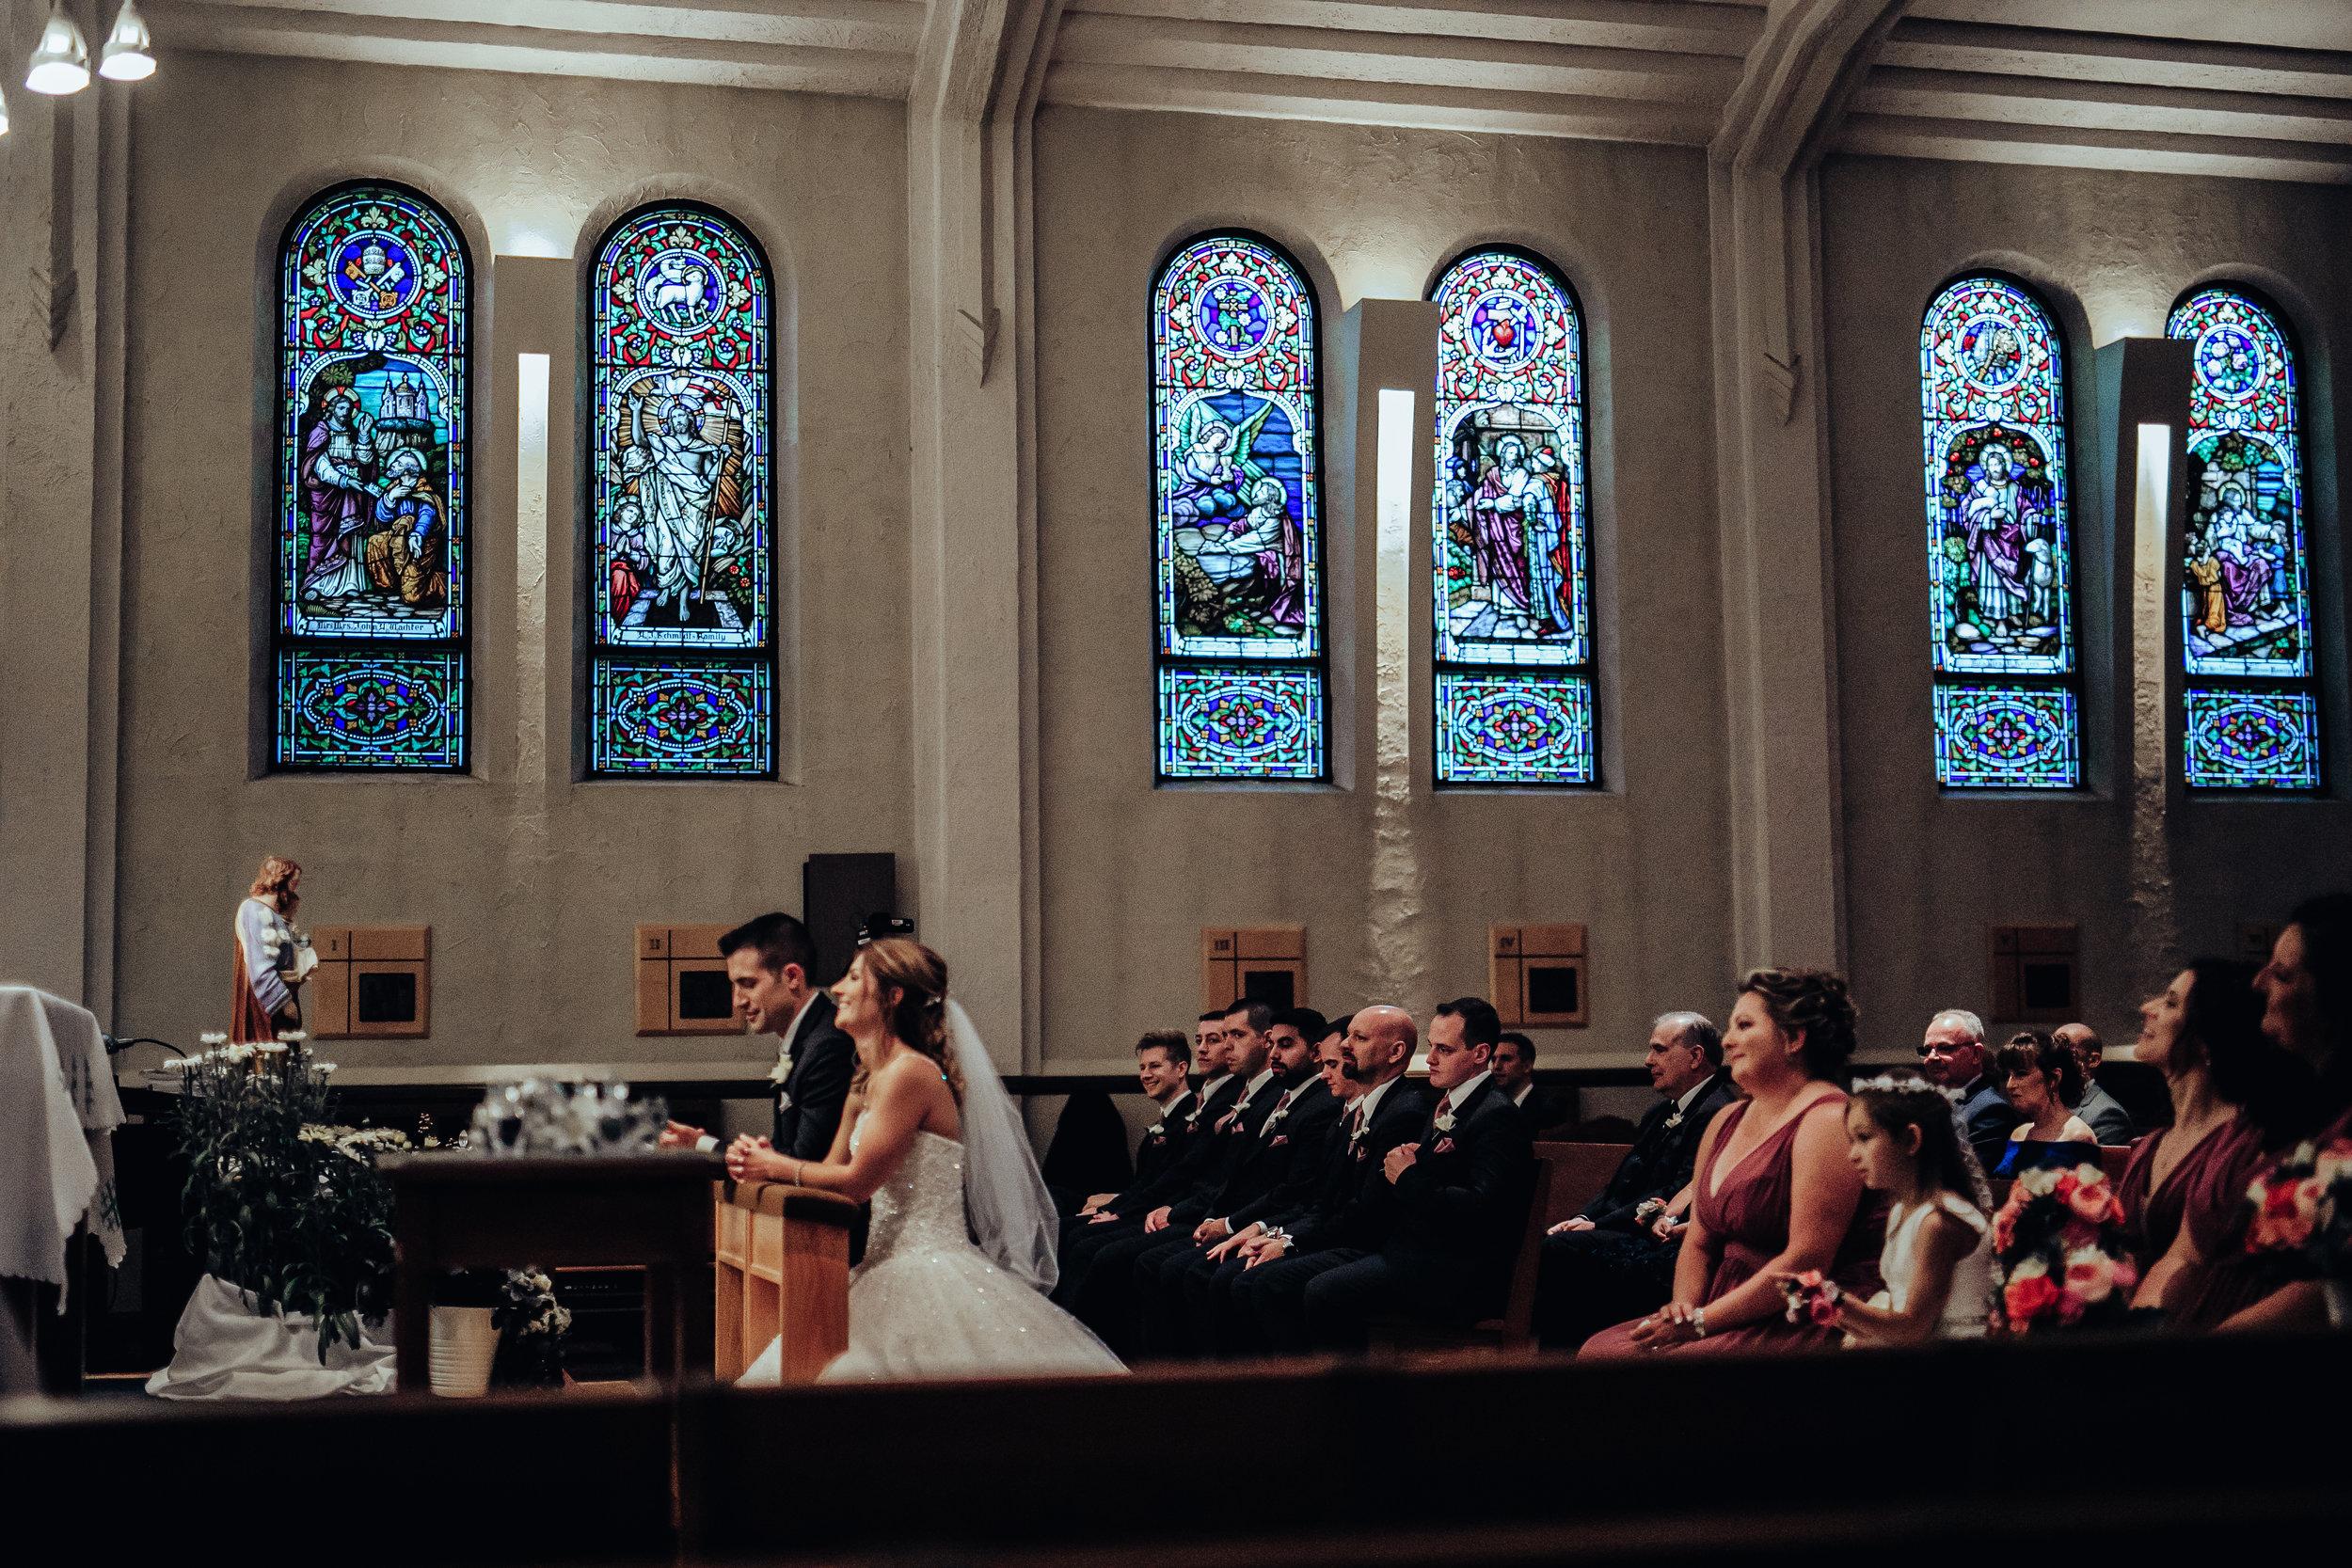 Wedding-couple-takes-photos-at-lowes-hardware-due-to-rain32.jpg